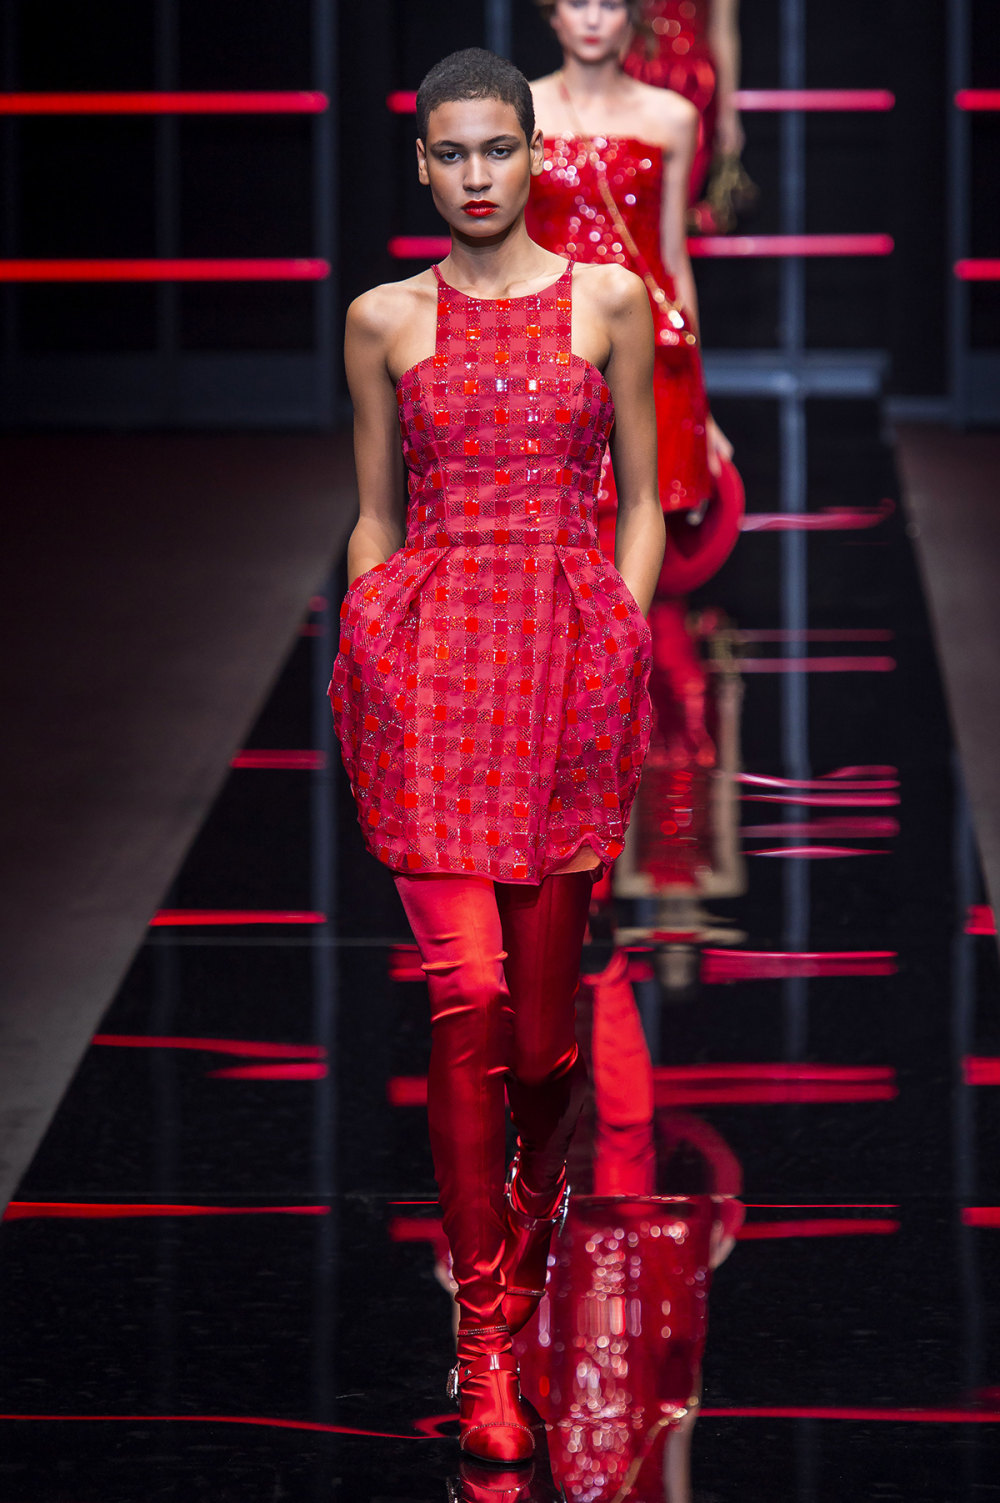 Emporio Armani时装系列畅的裤子带有柔滑裙子的鸡尾酒礼服-60.jpg